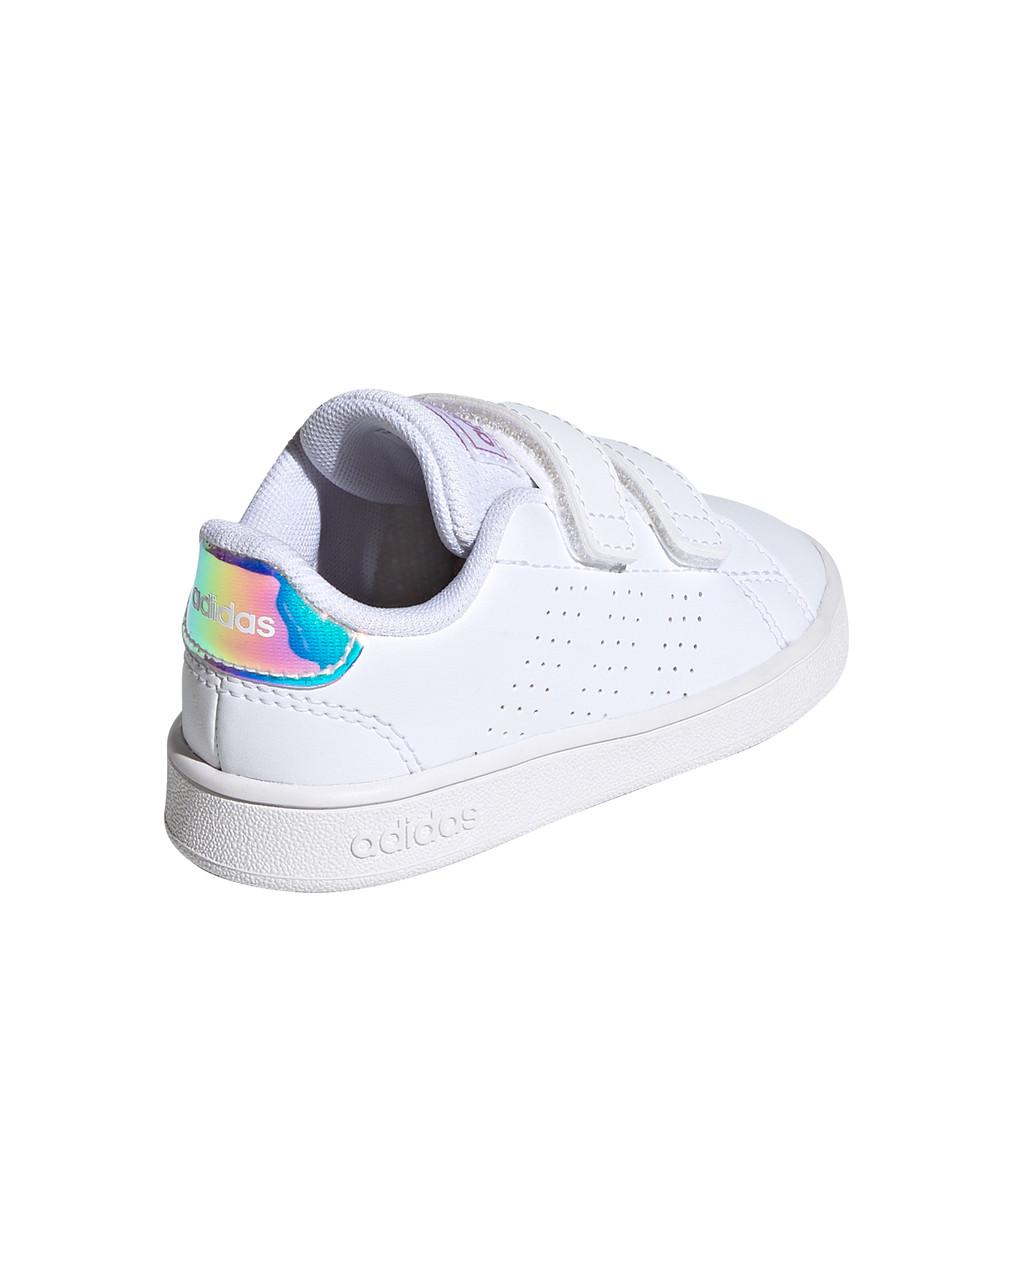 Adidas sneaker bimba chiusura con lacci - Adidas